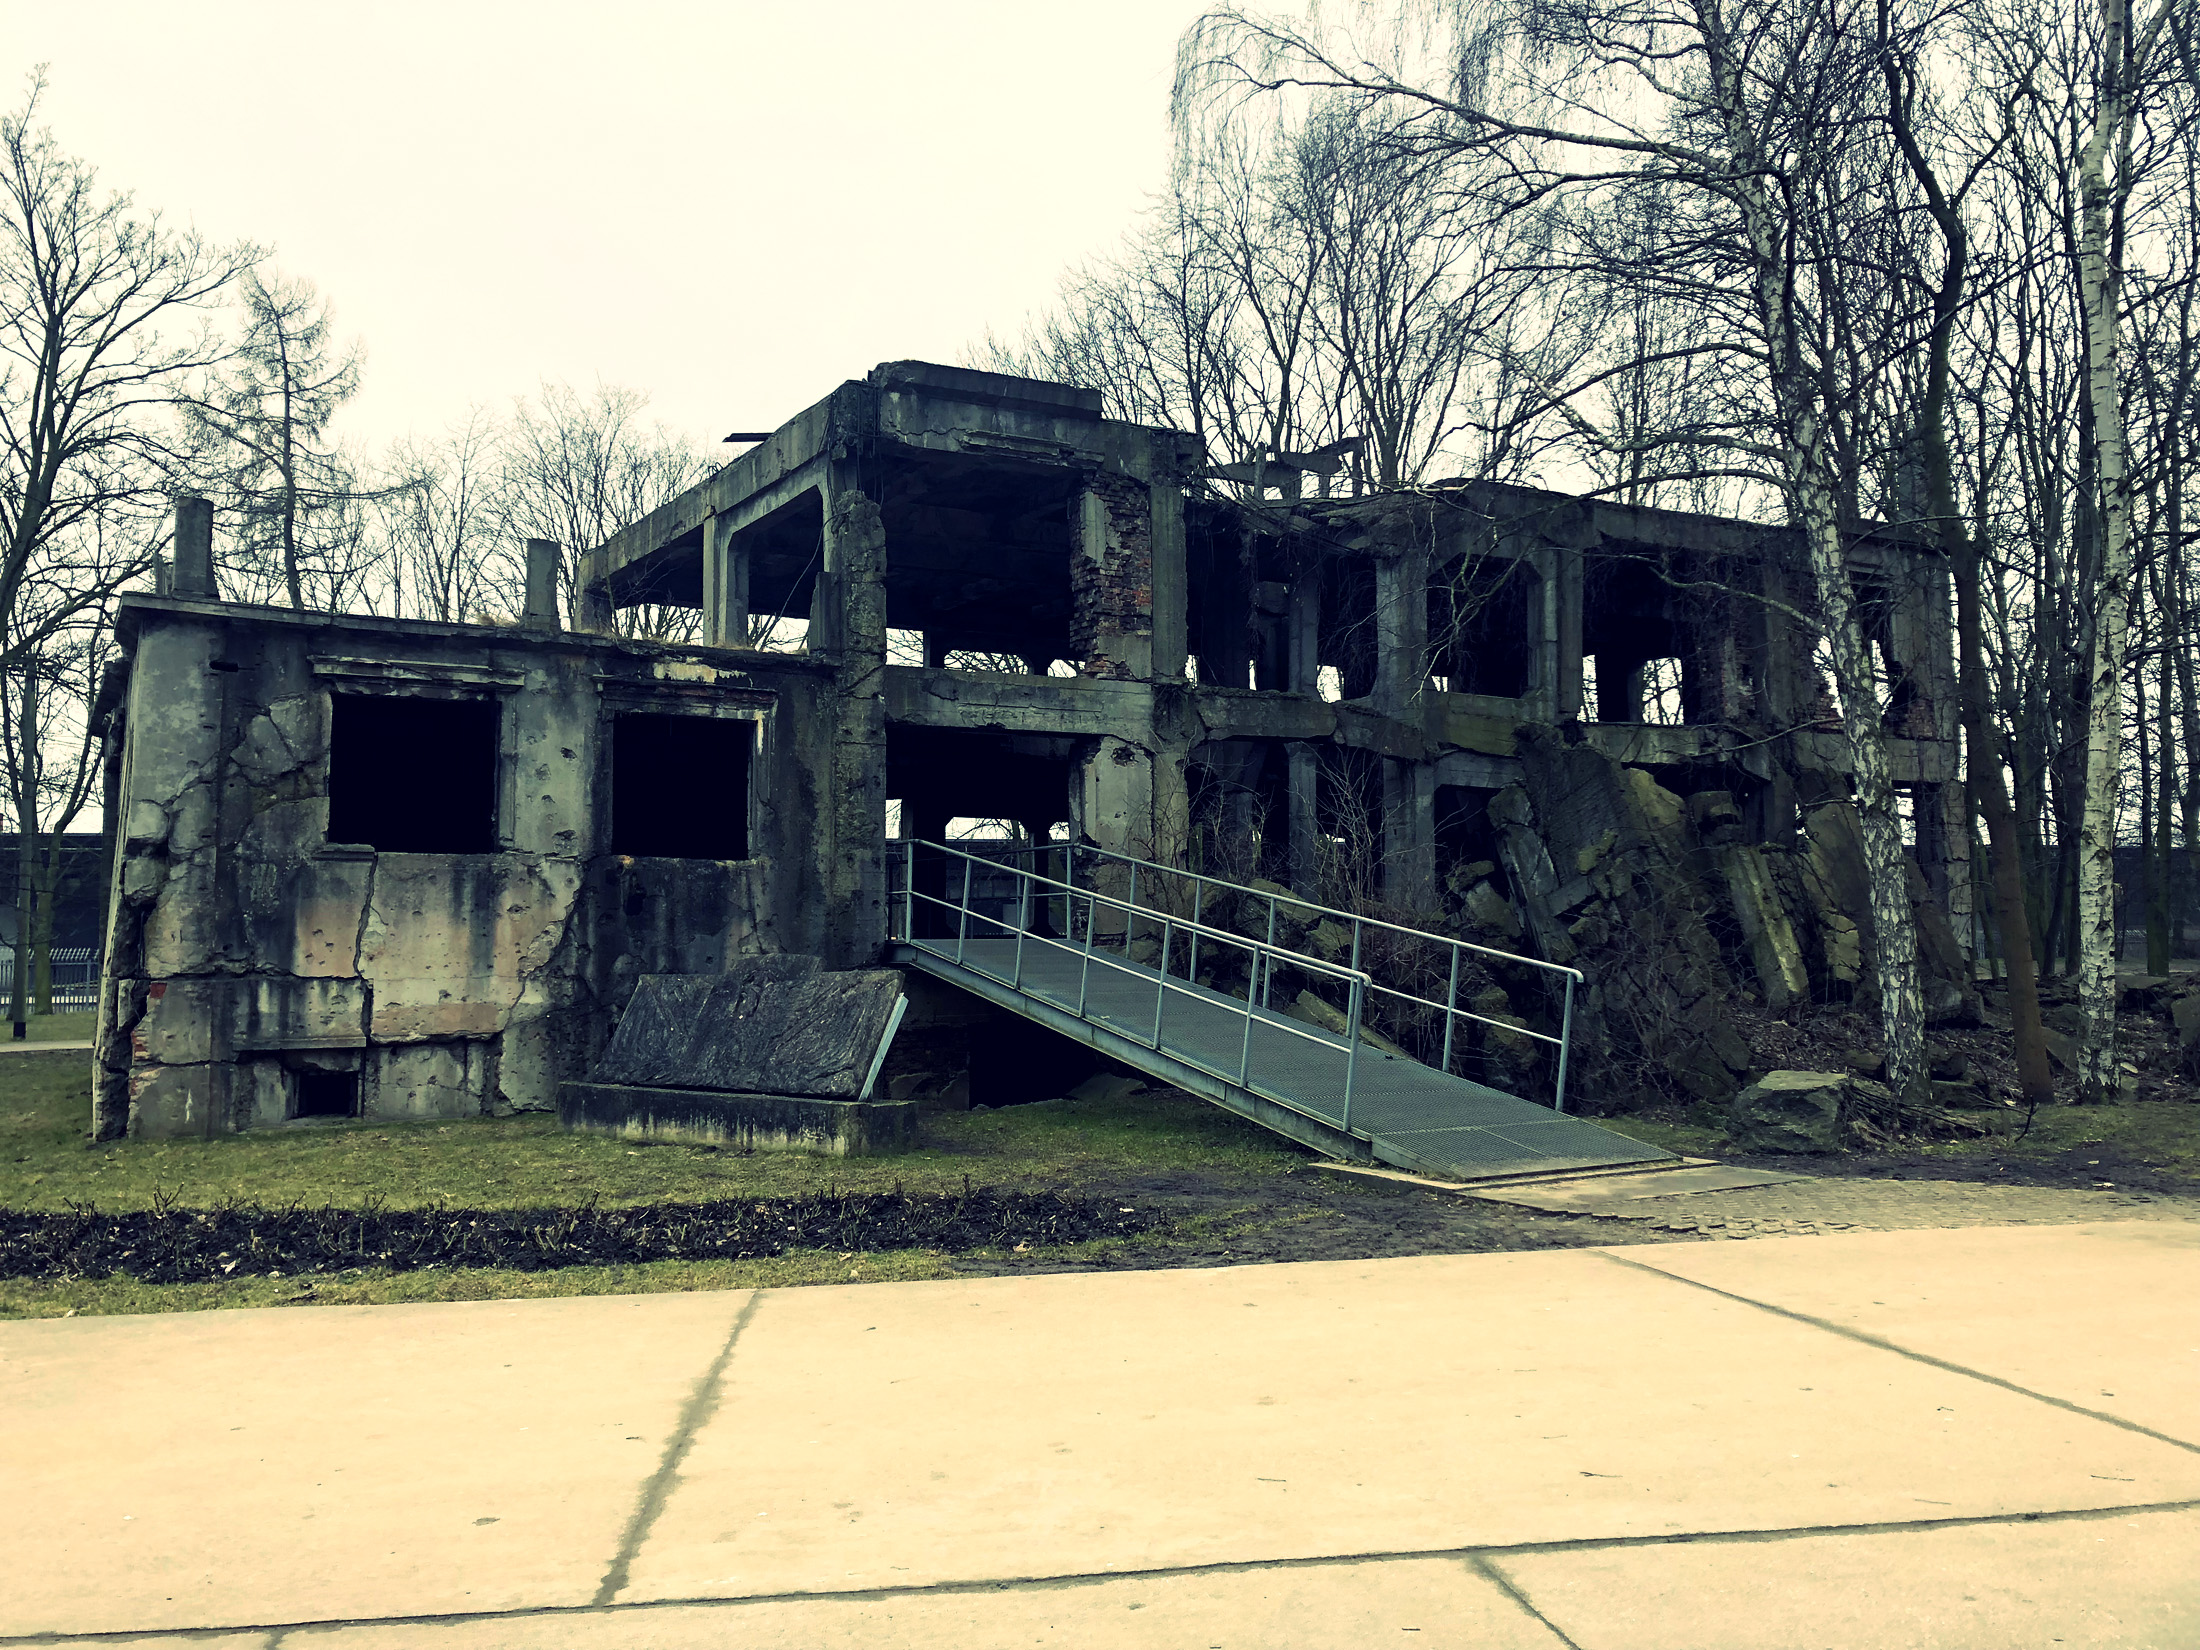 Westerplatte Ruiny Koszar